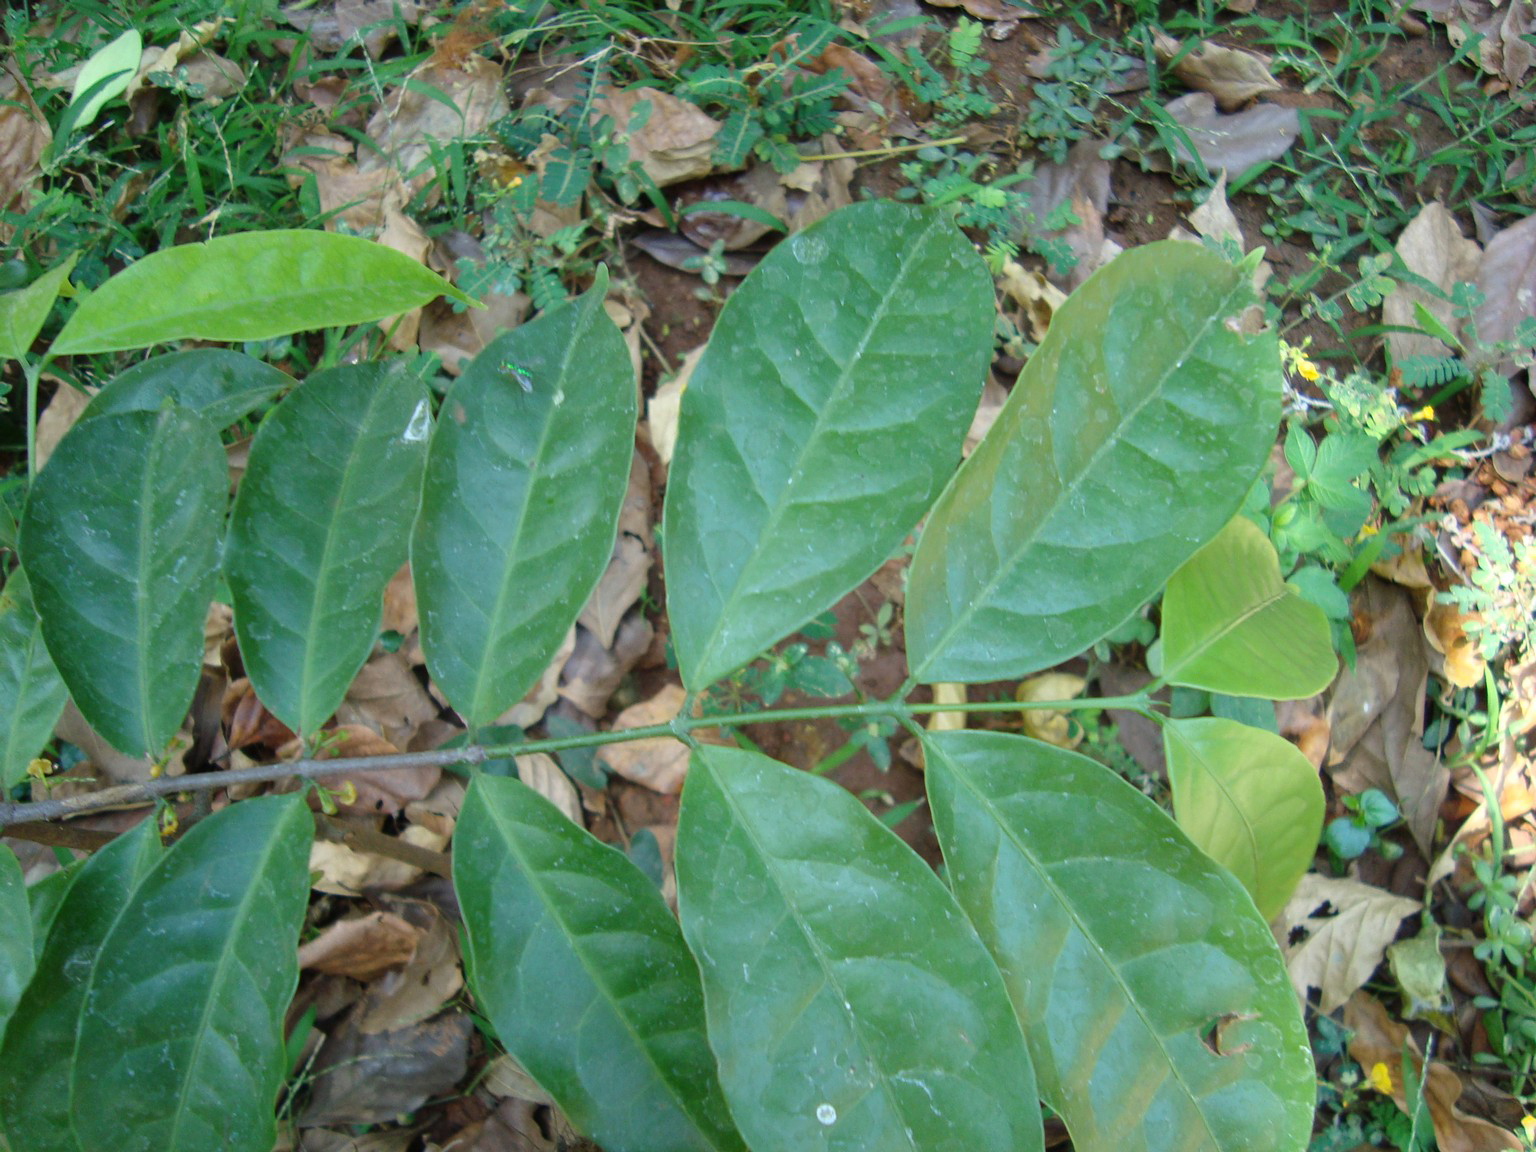 Salacia-reticulata-leaves